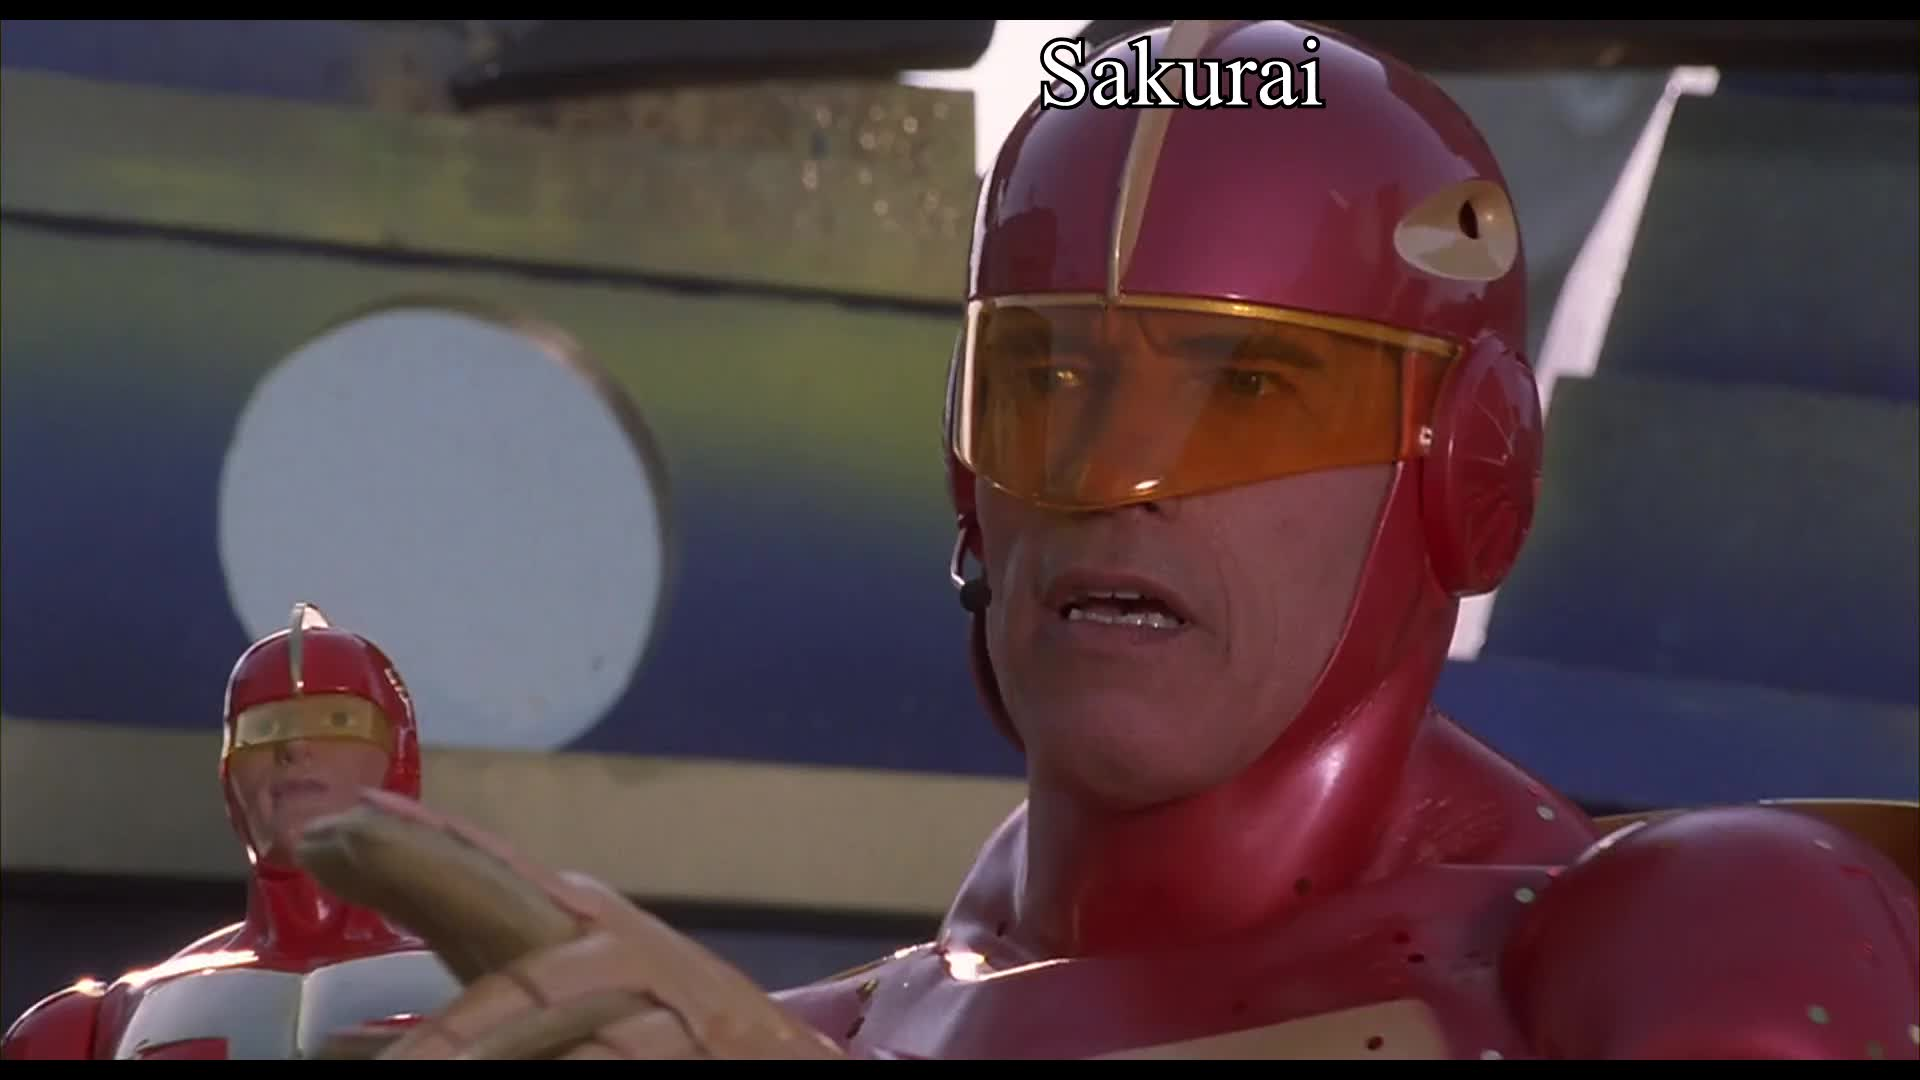 Sakurai GIFs